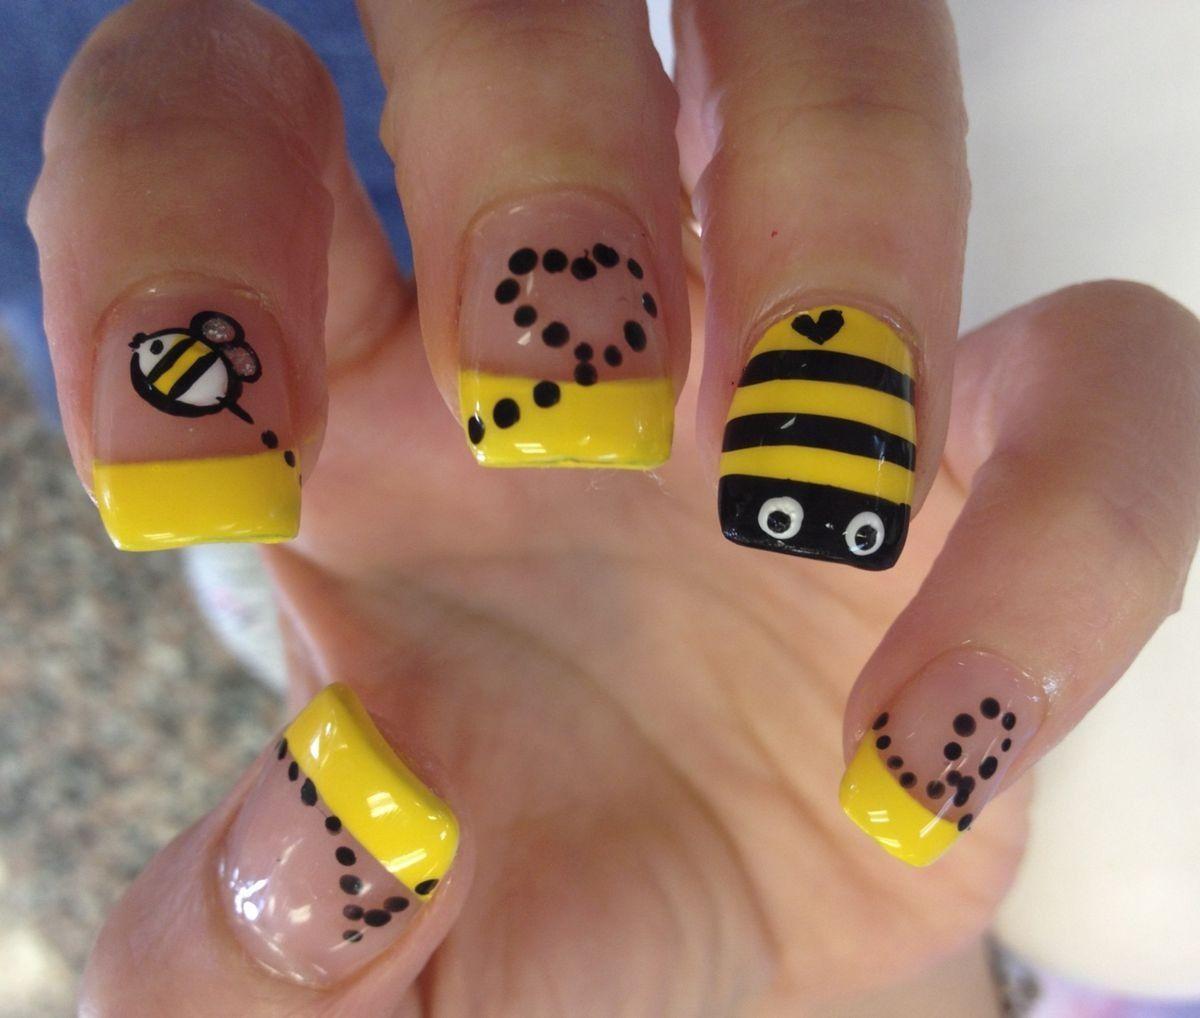 Nail Art Ideas Bee Design Nail Art Pictures Of Nail Art Design Ideas